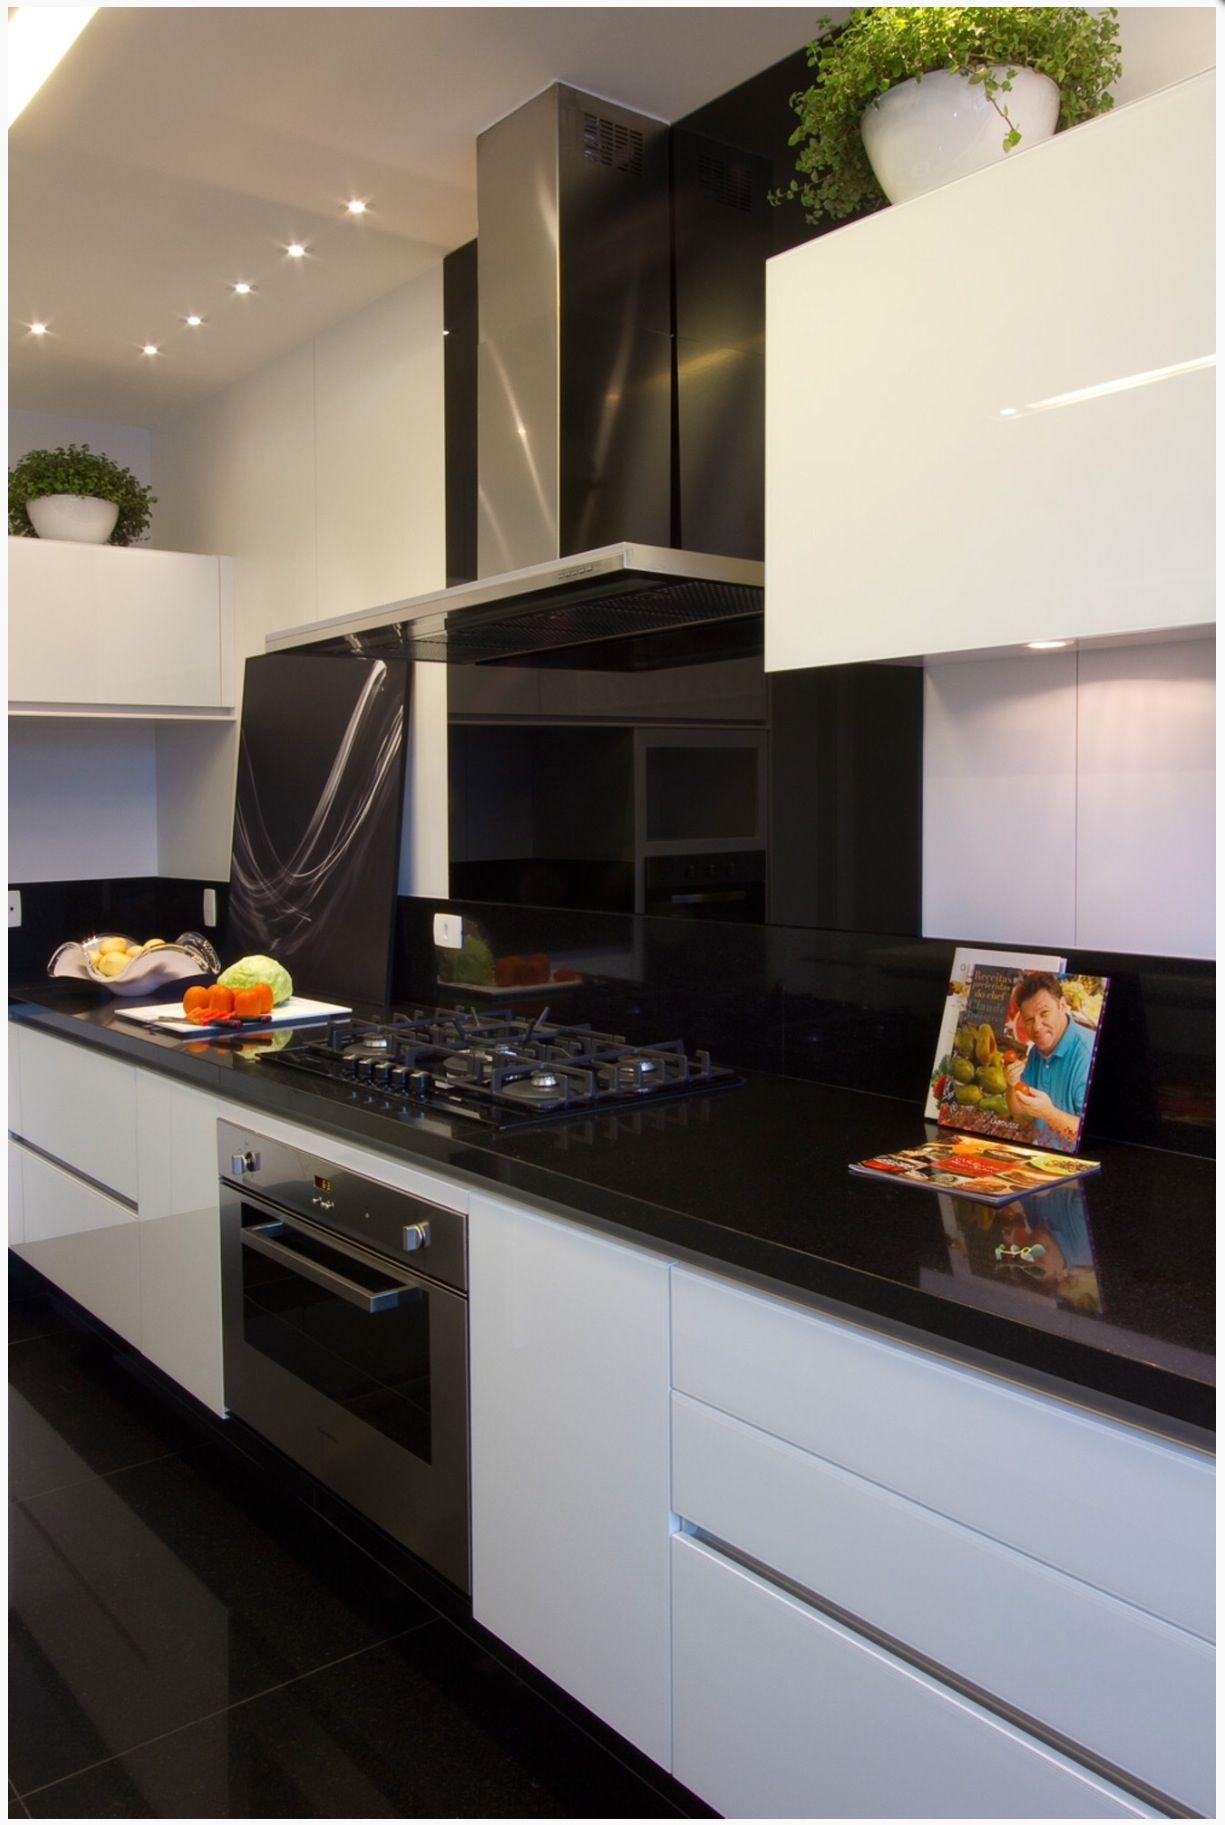 Cocina moderna  Cocinas  Pinterest  Kitchens Kitchen